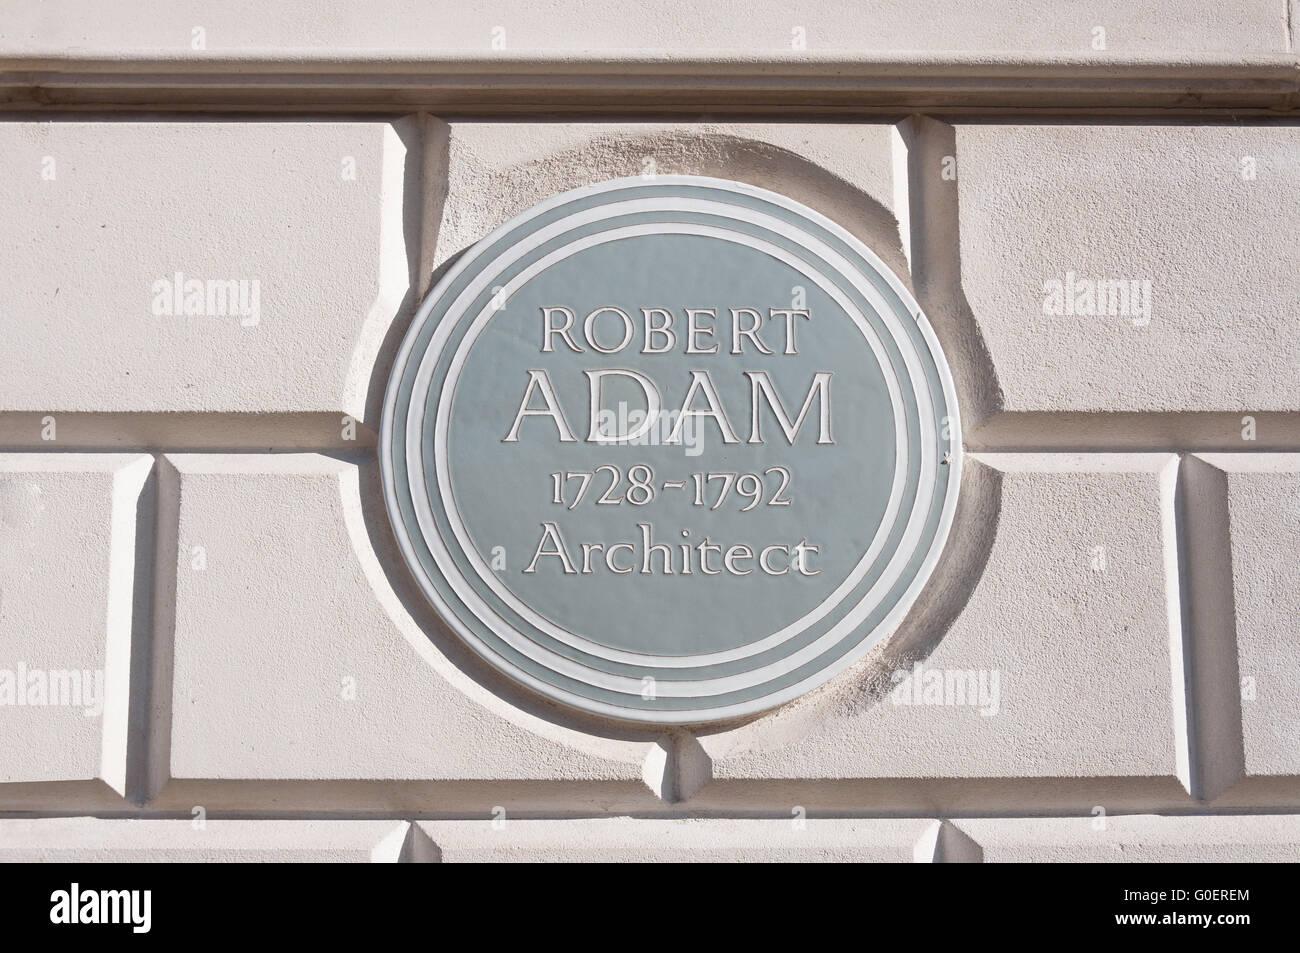 Robert Adam plaque on 18th century townhouse, Fitzroy Square, Fitzrovia, Borough of Camden, London, England, United - Stock Image